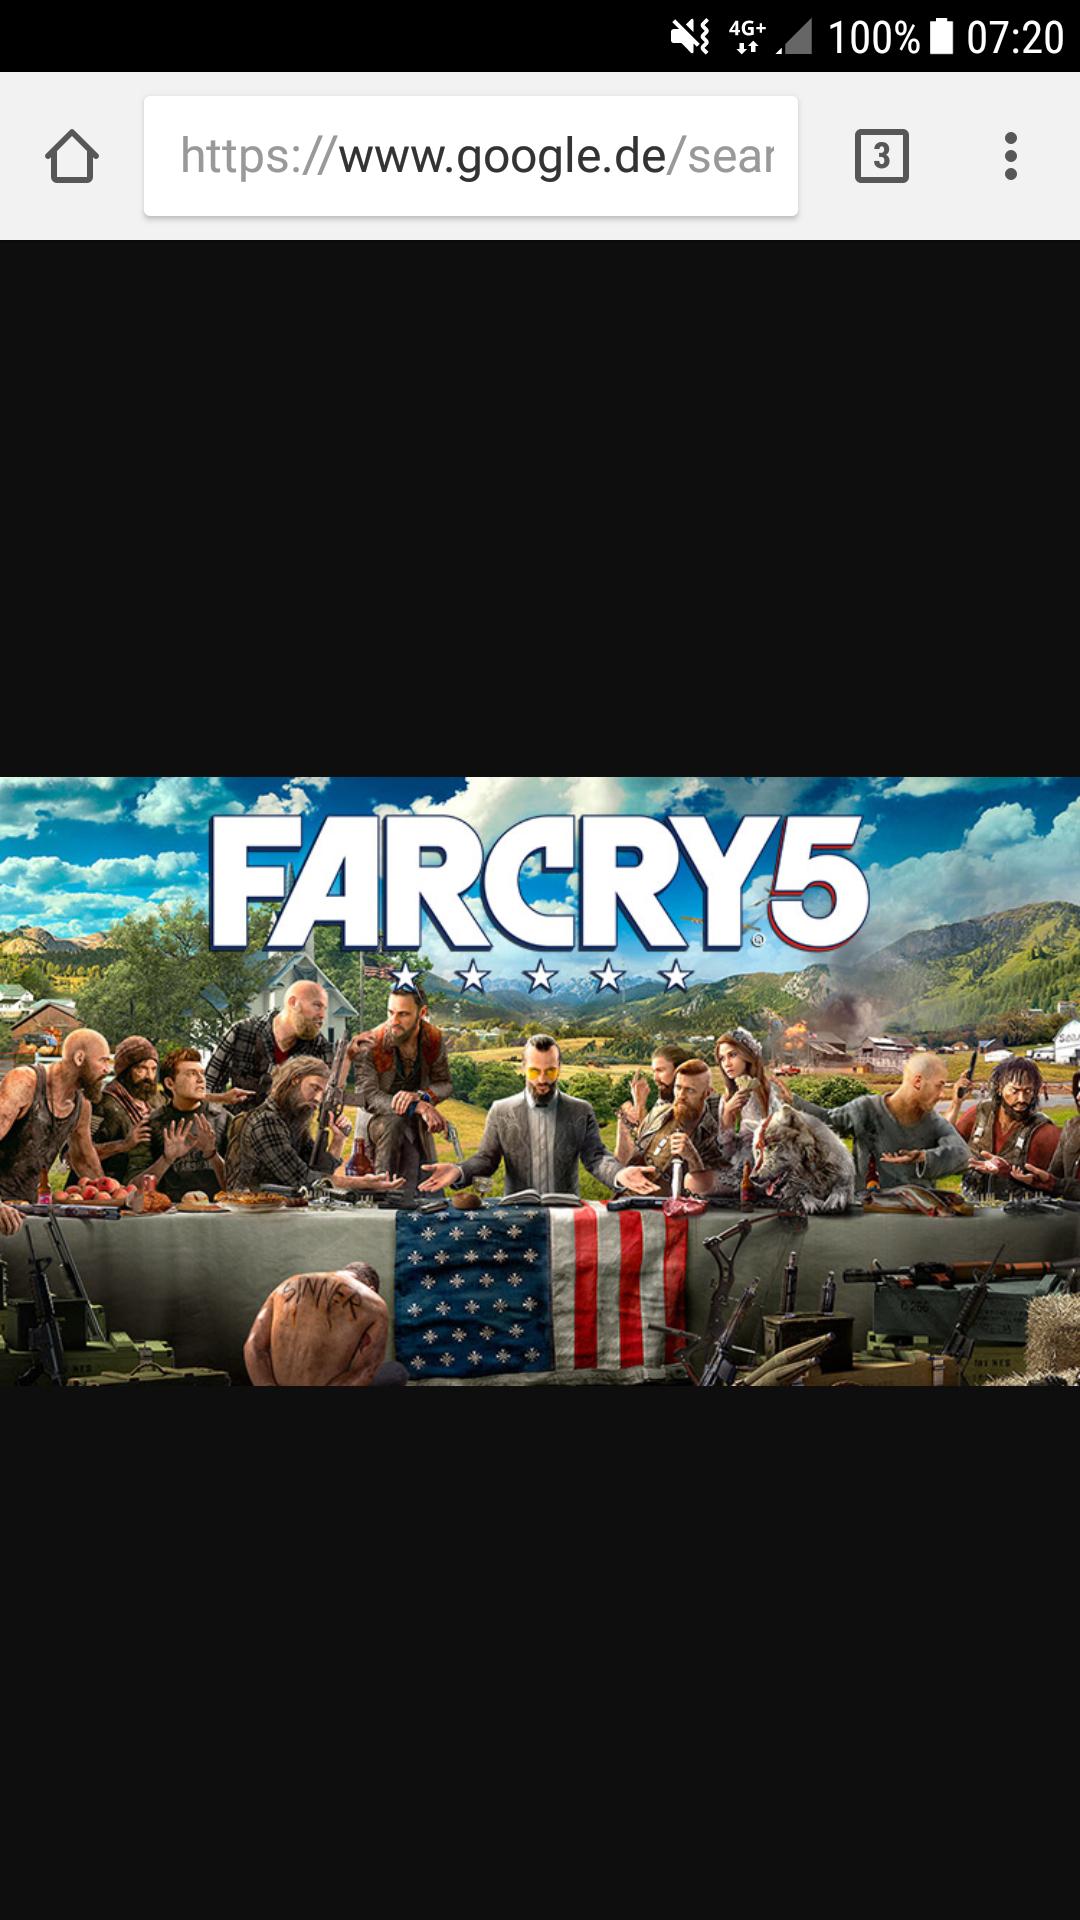 Farcry 5 Preorder nur 39.99€ für Pc